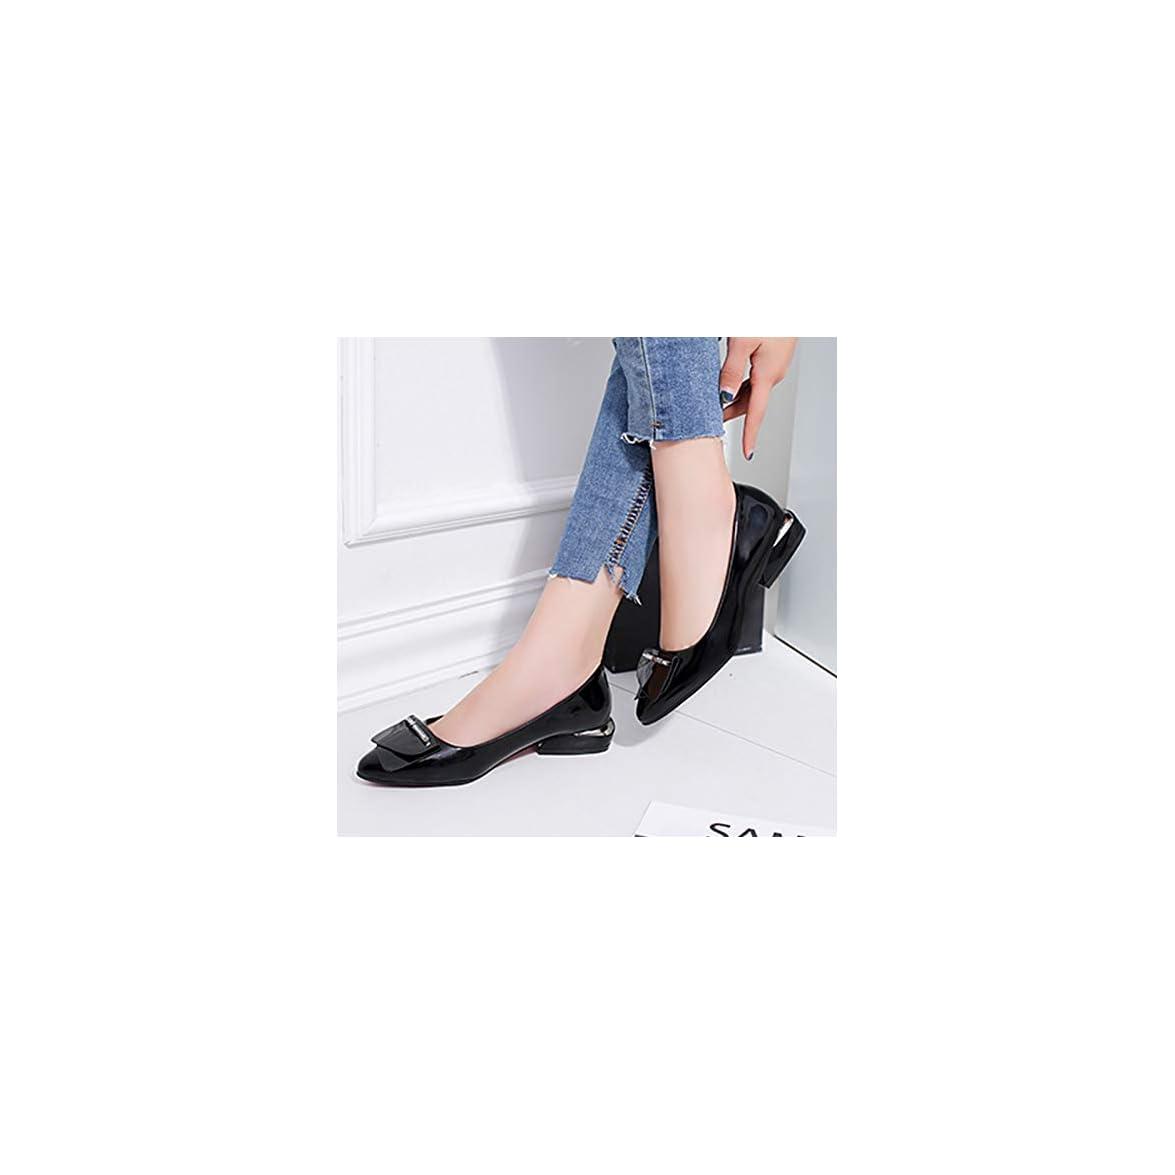 fd0f697a616100 Barca Metal Da Ladies Xsy Scarpe Woman Ol Shoes Heels Office High ...